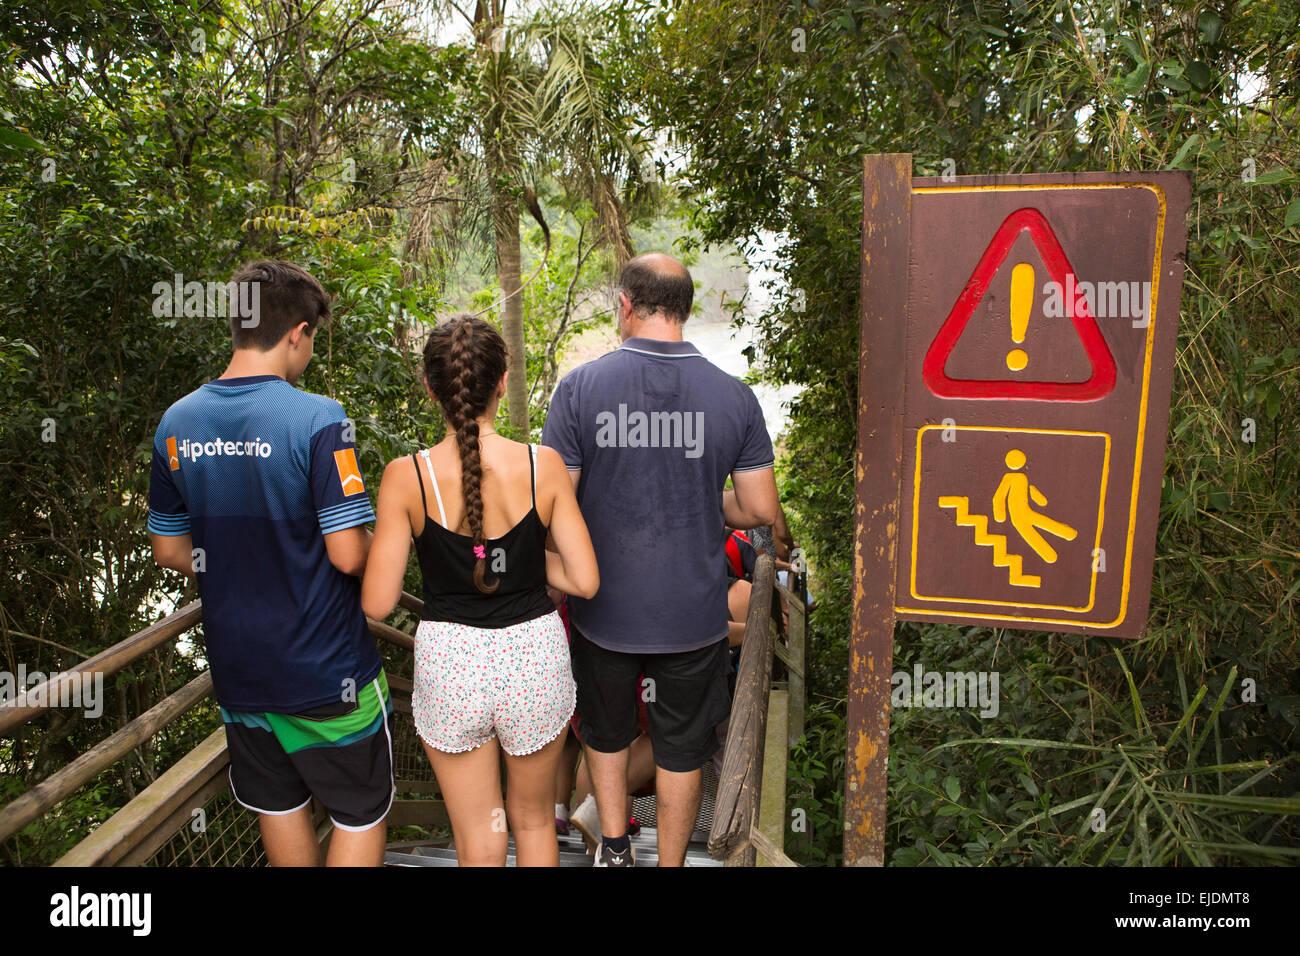 Argentina, Iguazu Falls, Circuito Inferior, lower circuit walkway, danger, slippery step warning sign - Stock Image